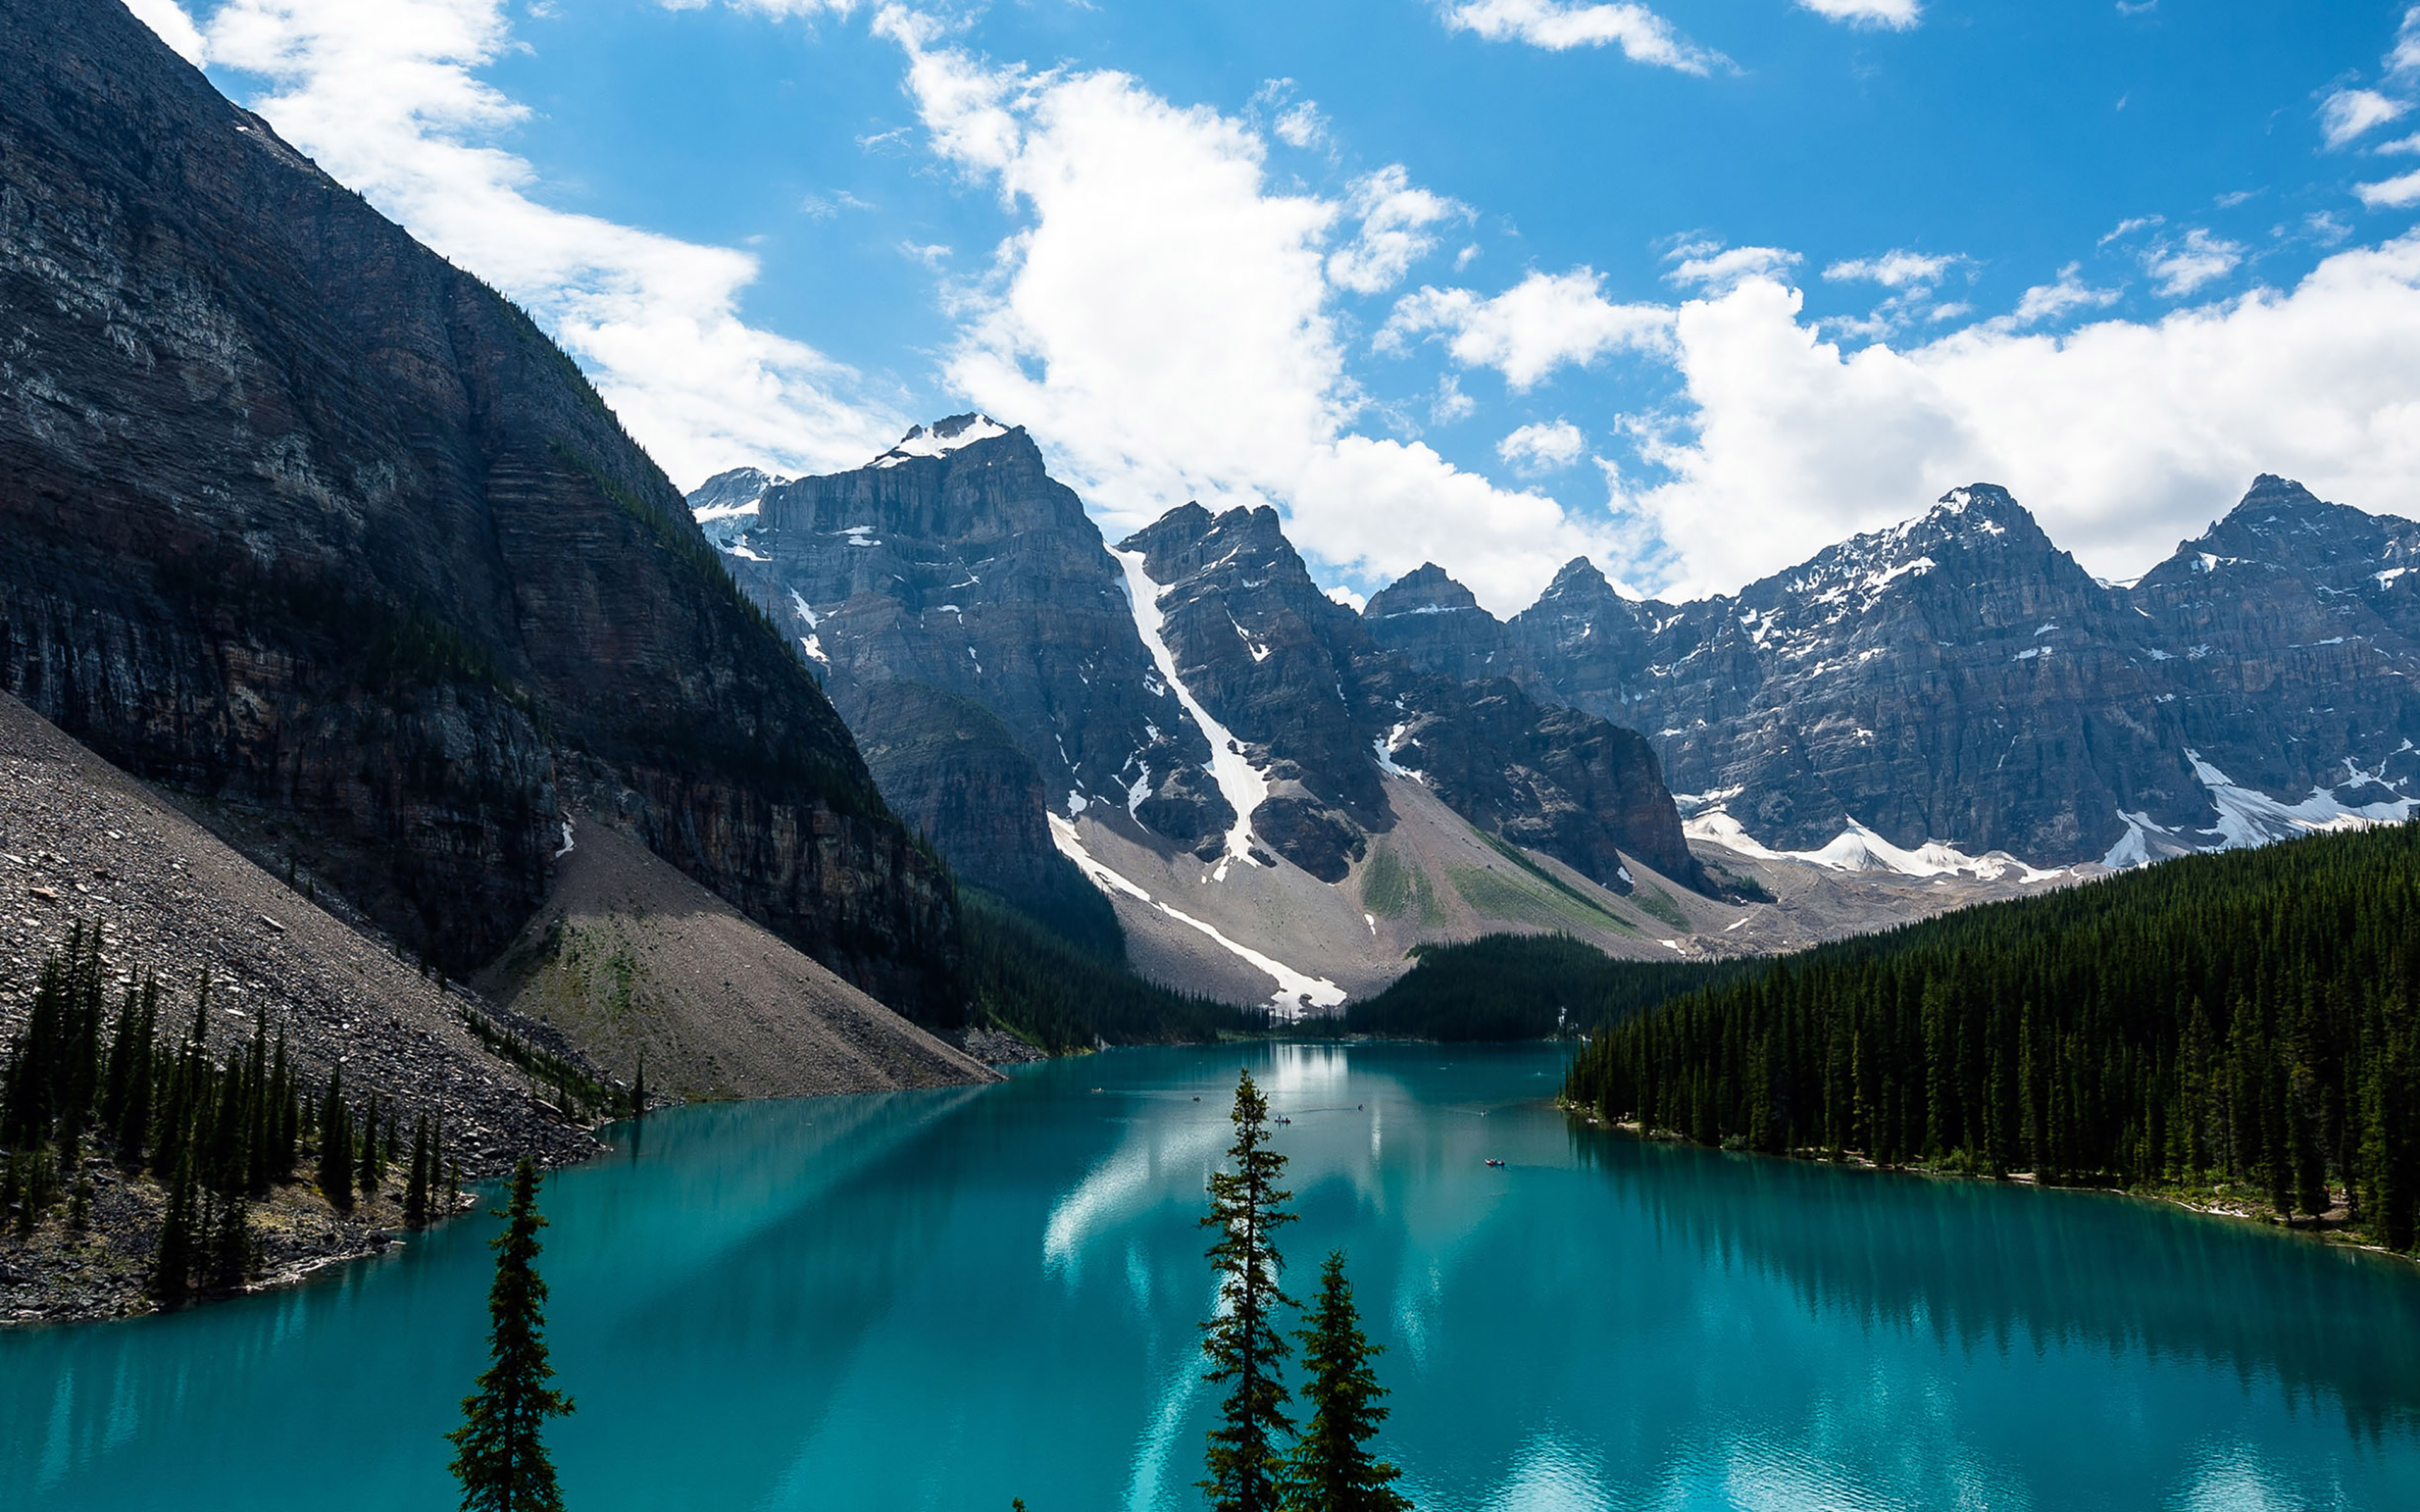 Mc33 Wallpaper Emerald Lake Canada Mountain Wallpaper